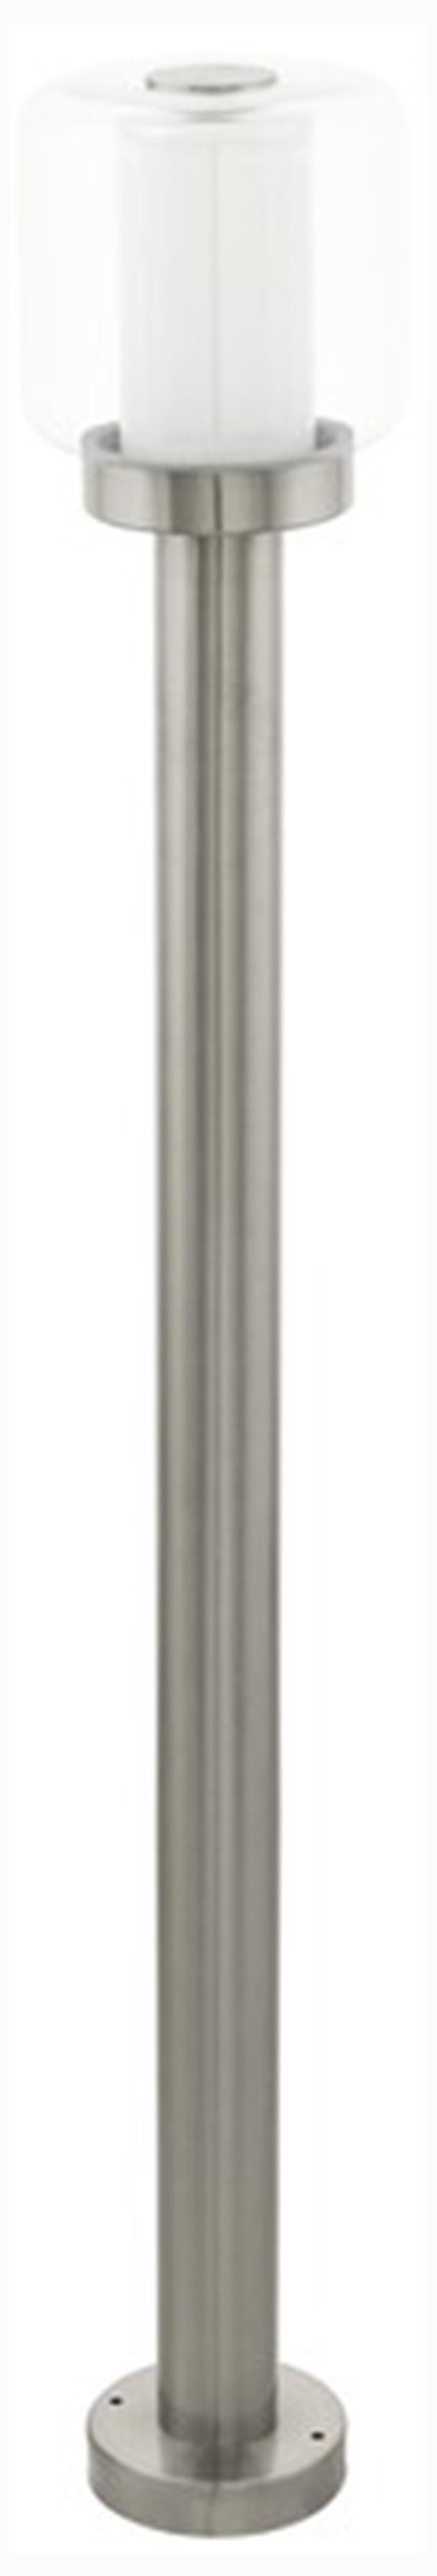 Ландшафтный столбик EGLO 95019